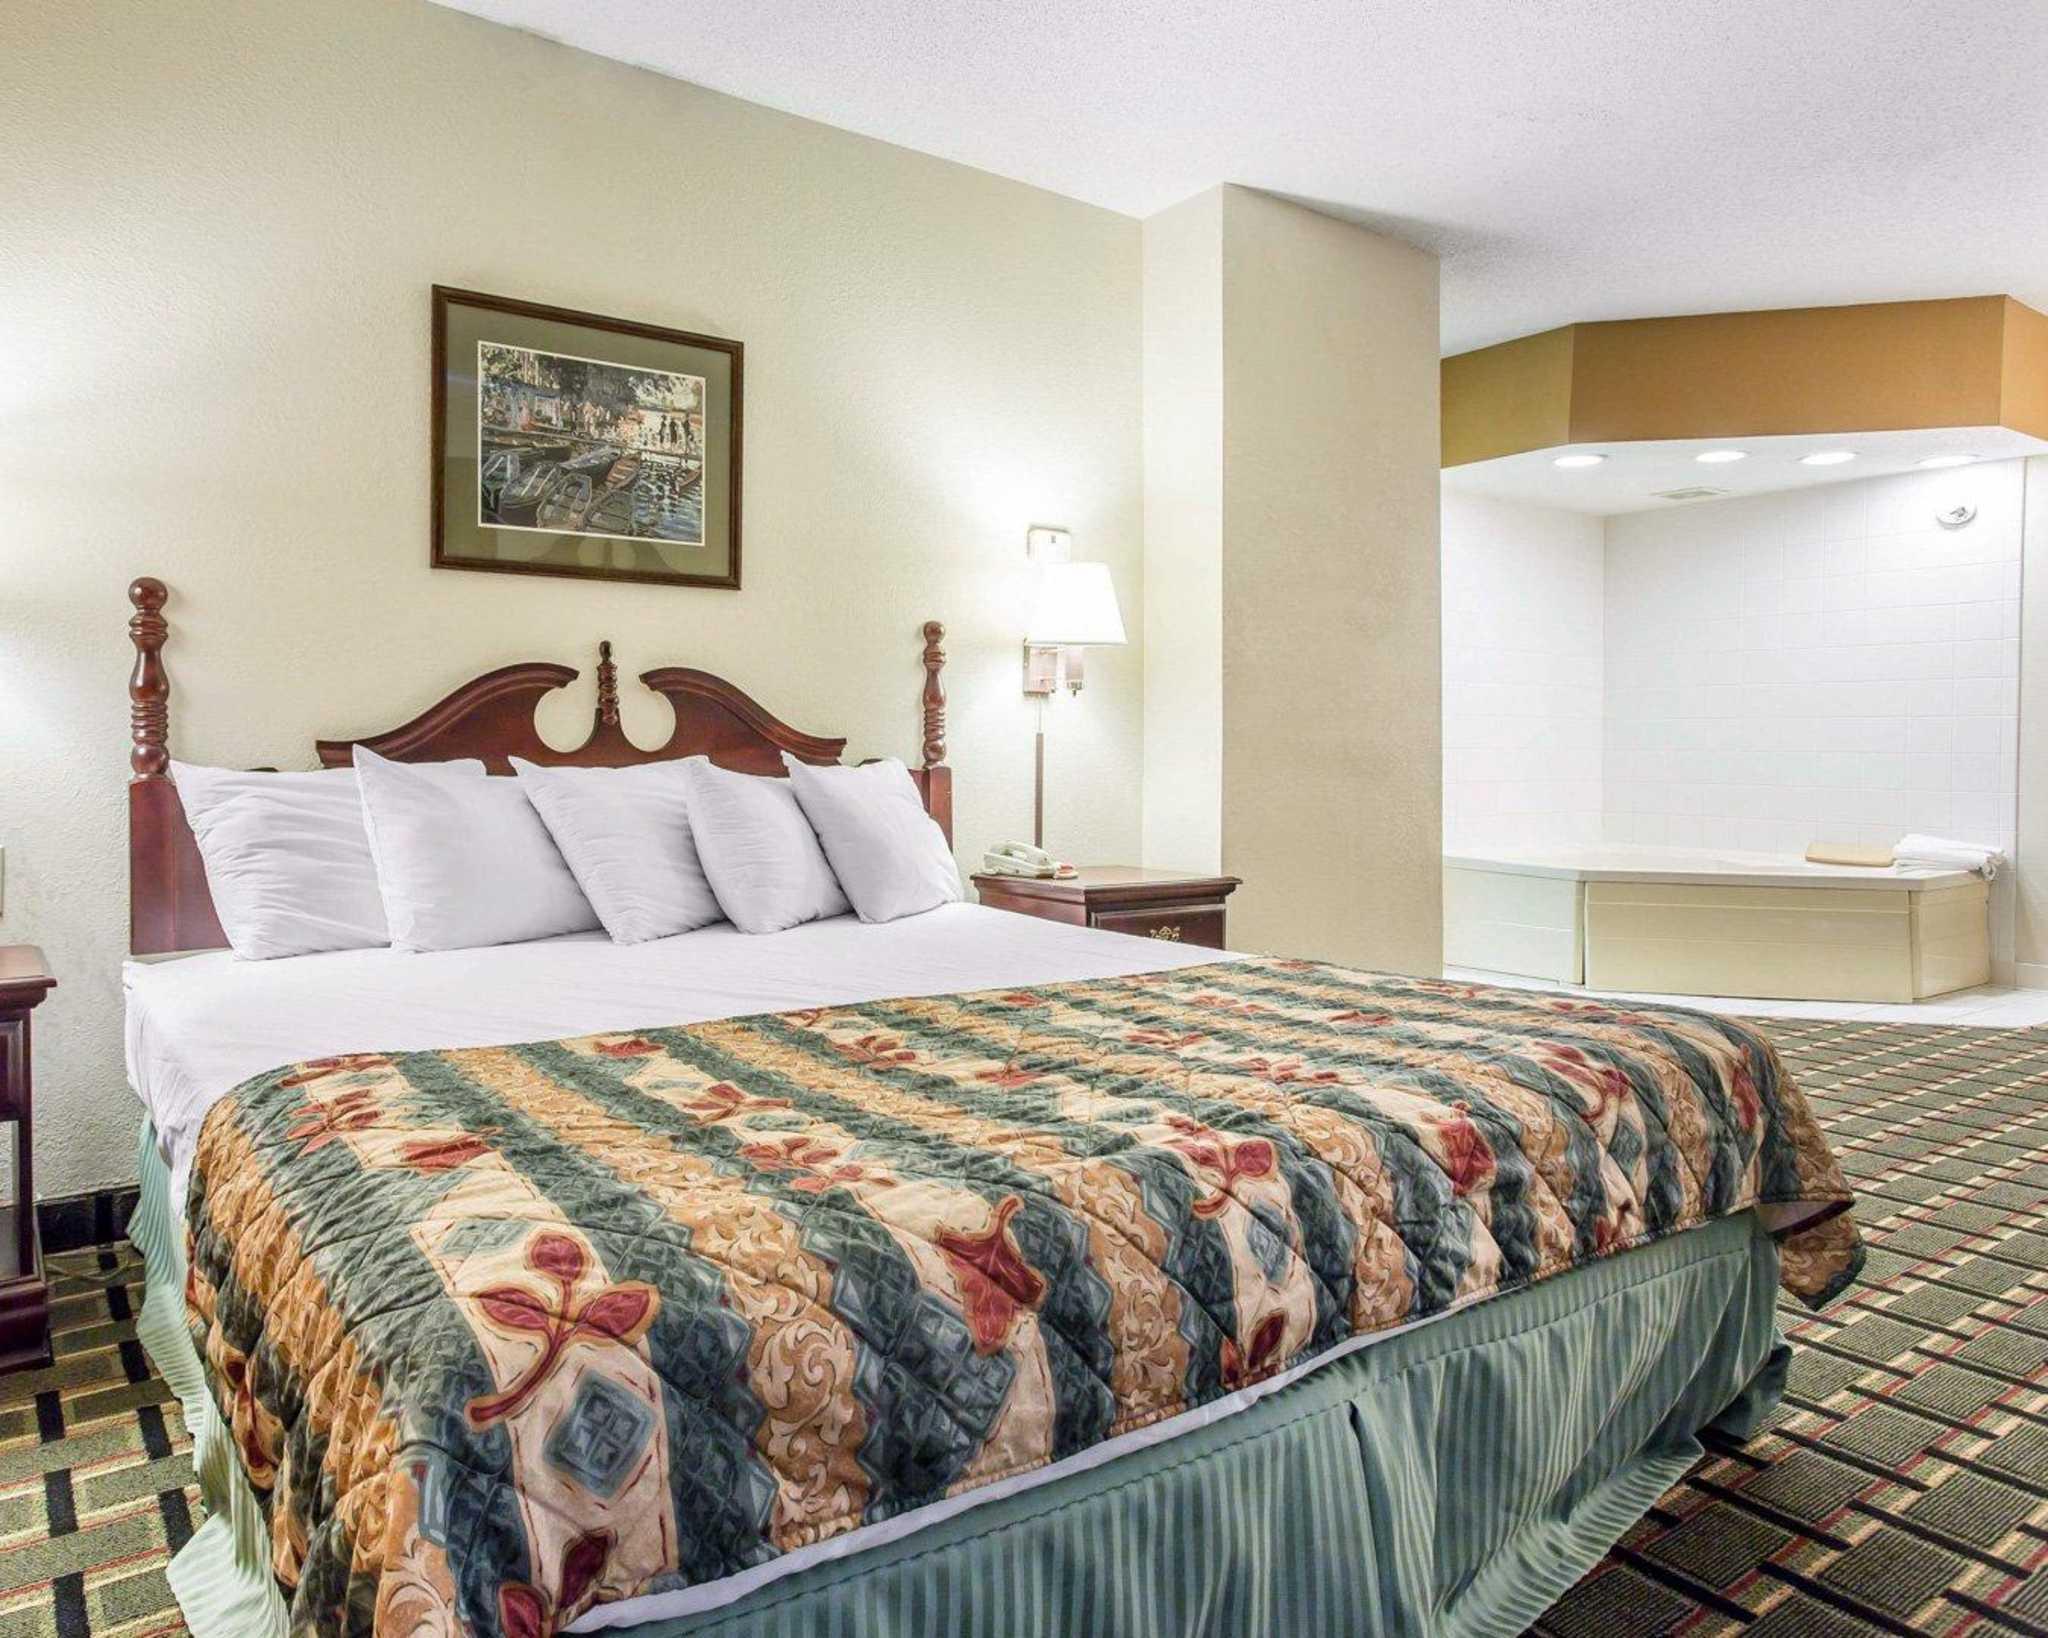 Rooms For Rent Near Marietta Ga